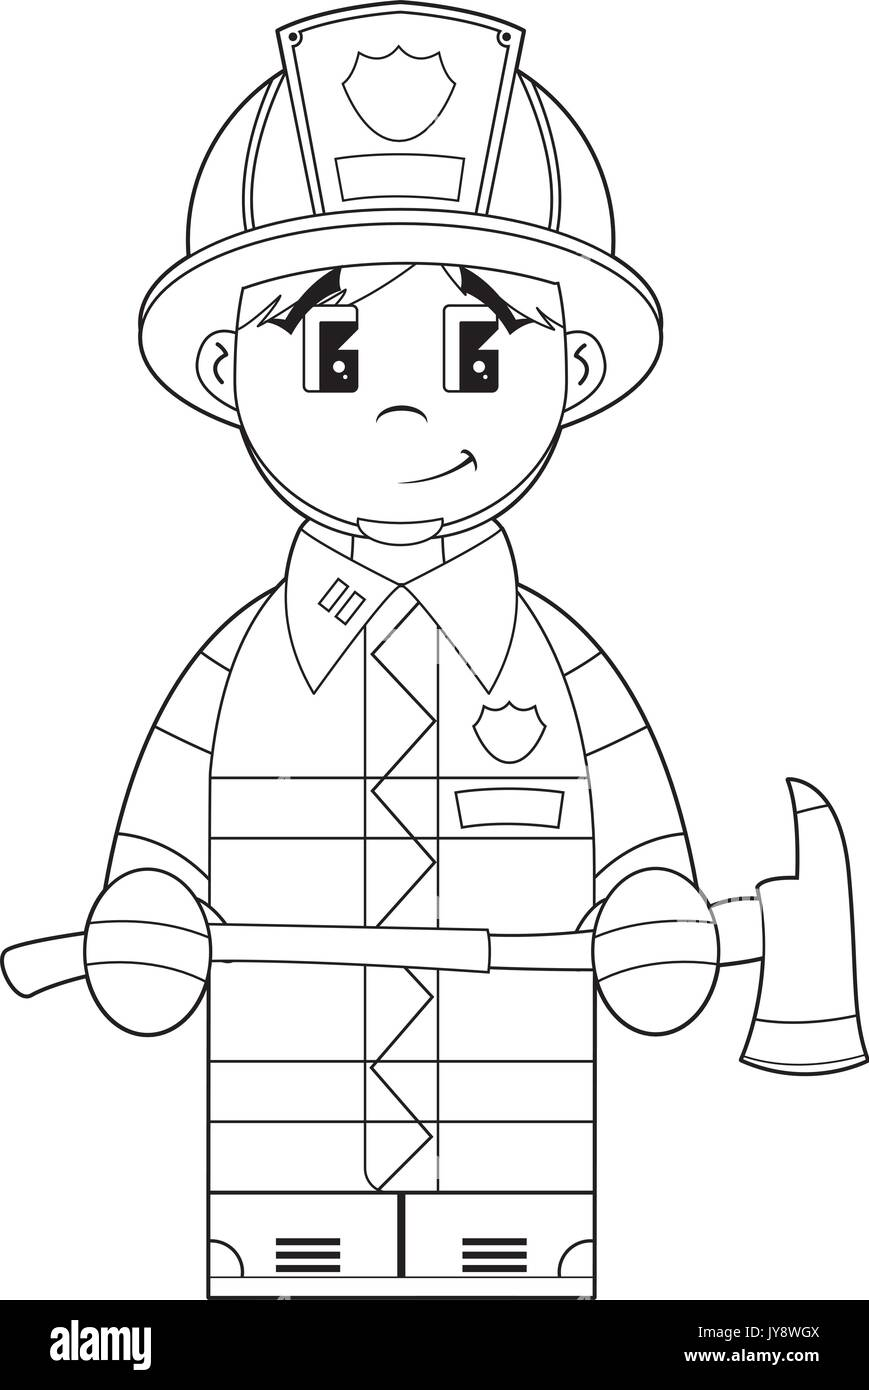 illustration drawing emergency services stock photos illustration